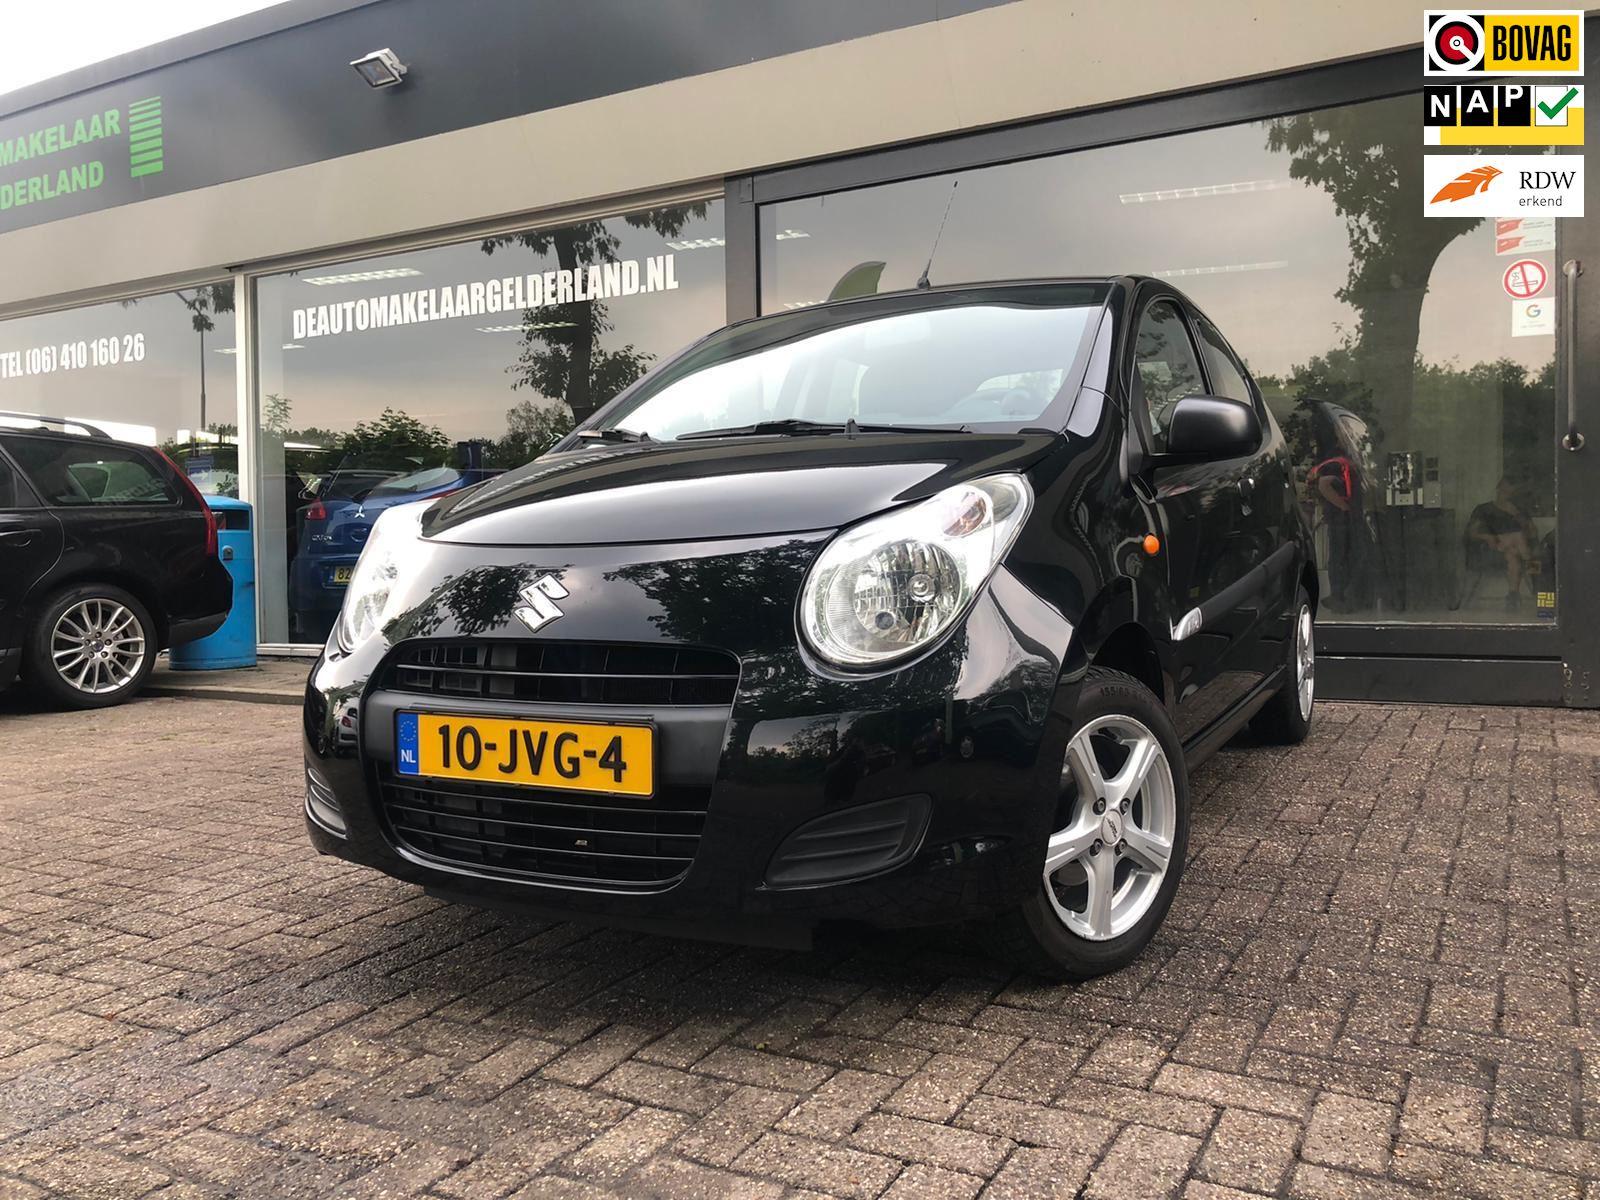 Suzuki Alto occasion - De Automakelaar Gelderland